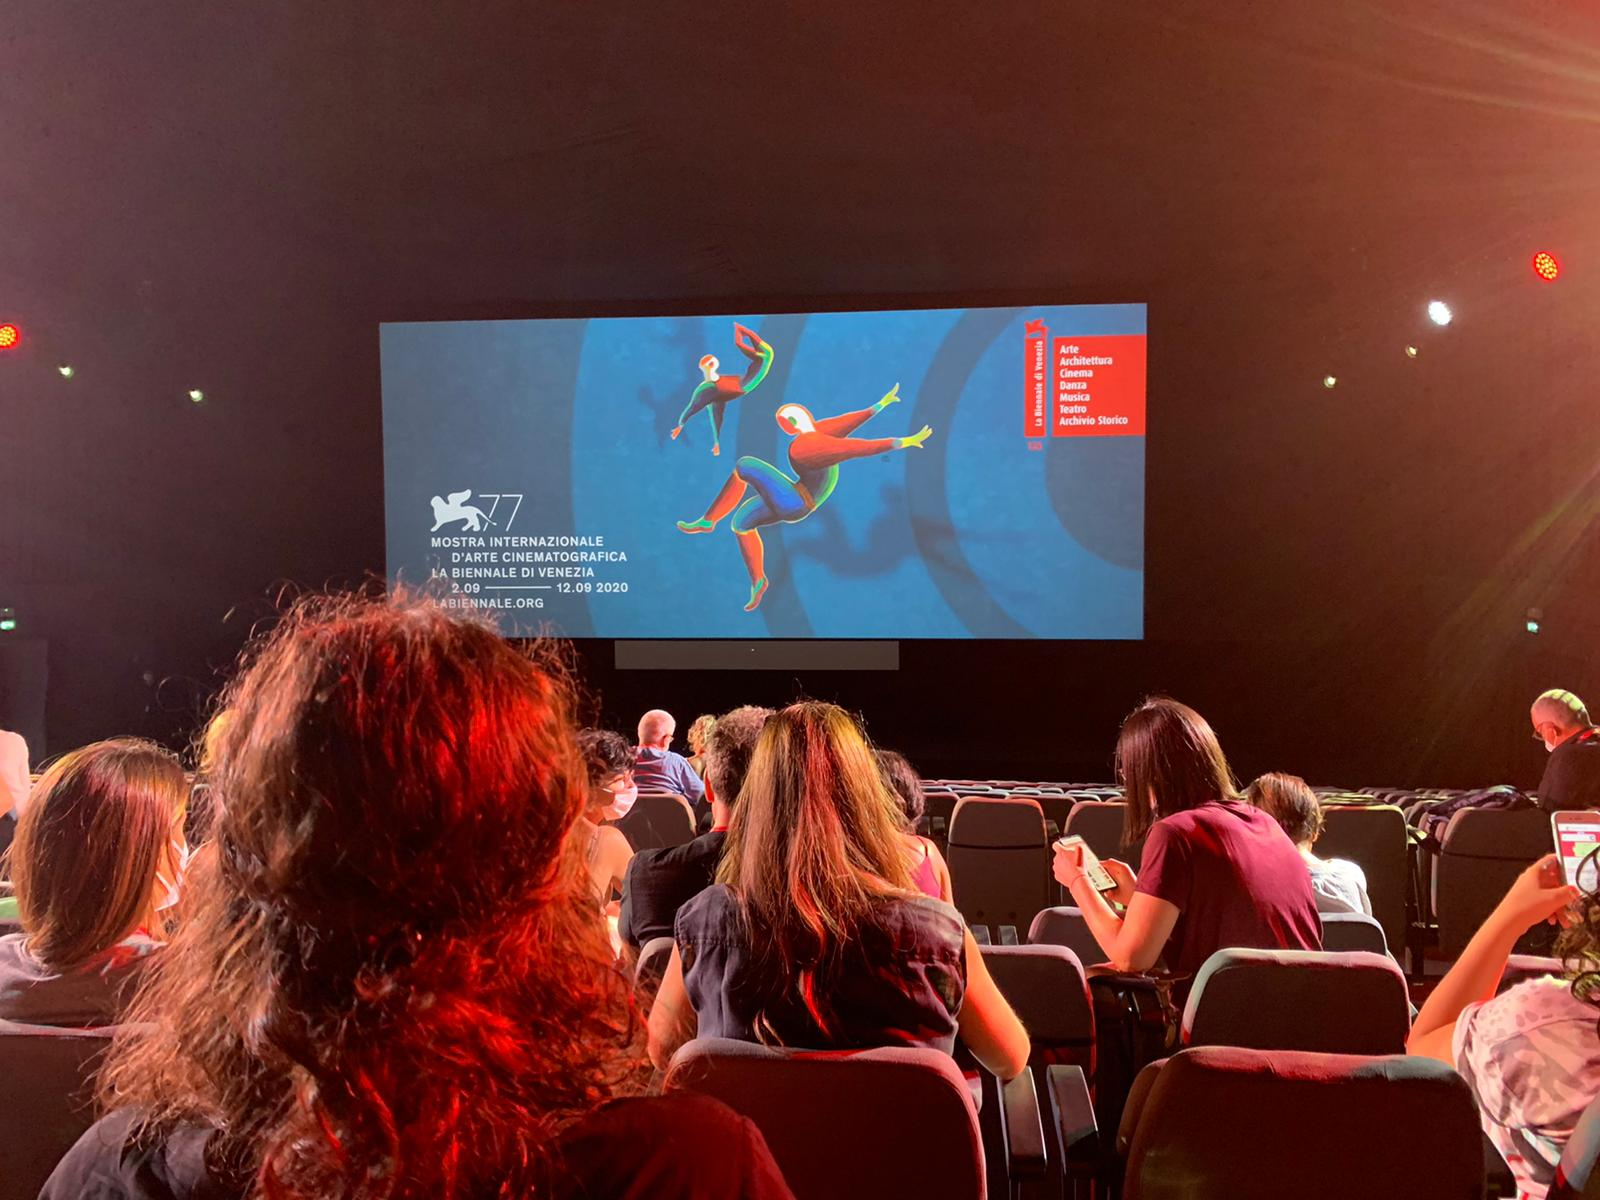 Festival Internacional de Cine de Venecia